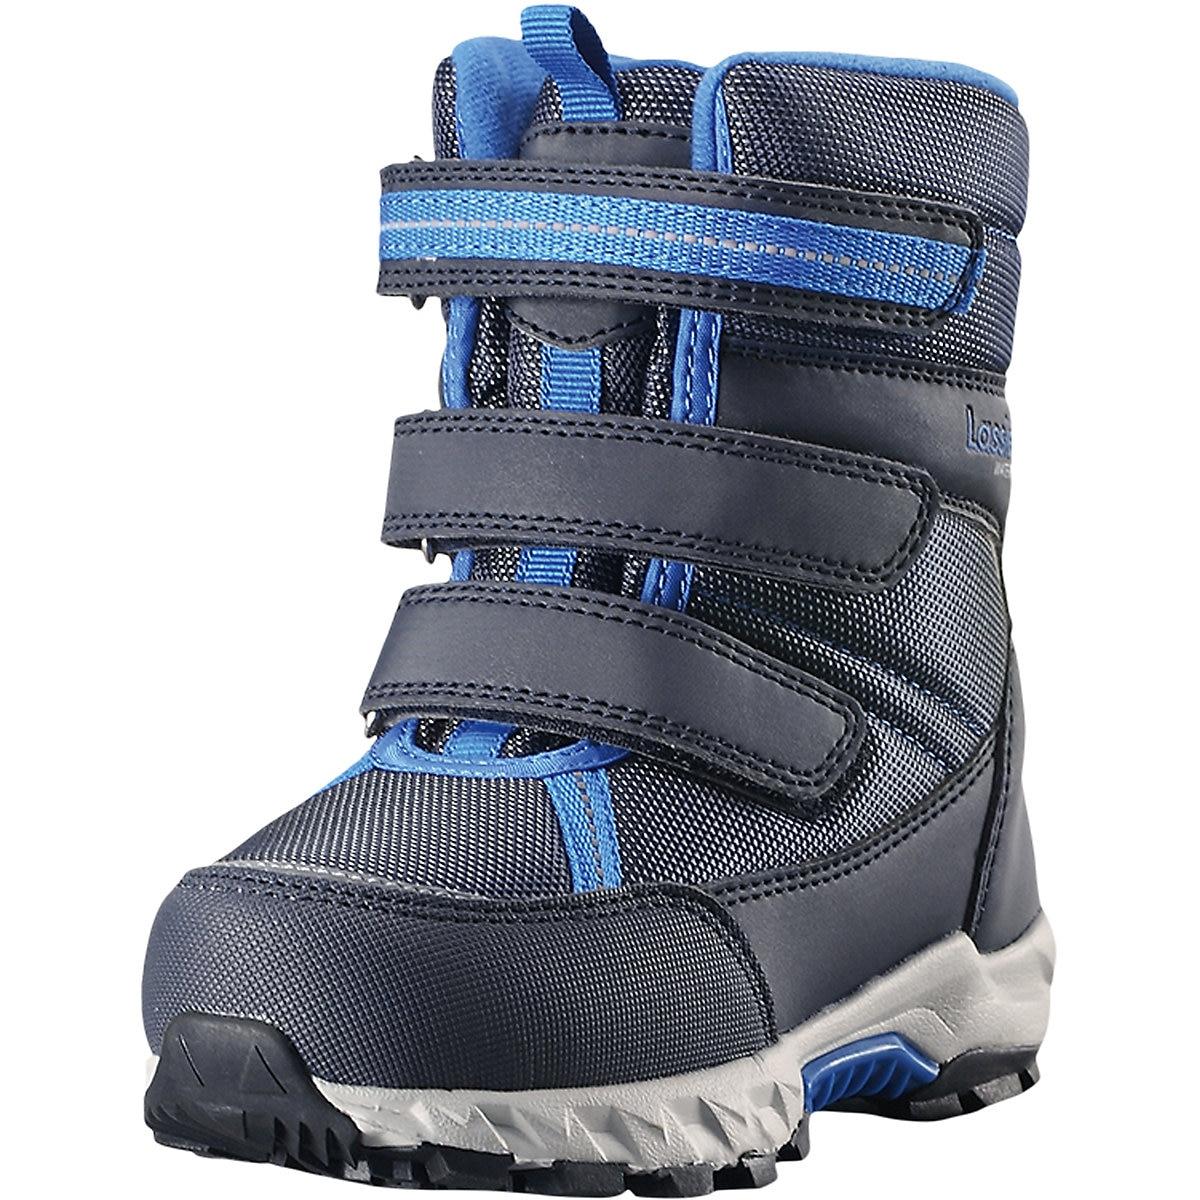 Boots LASSIE For Boys 8733013 Valenki Uggi Winter Shoes Children Kids MTpromo